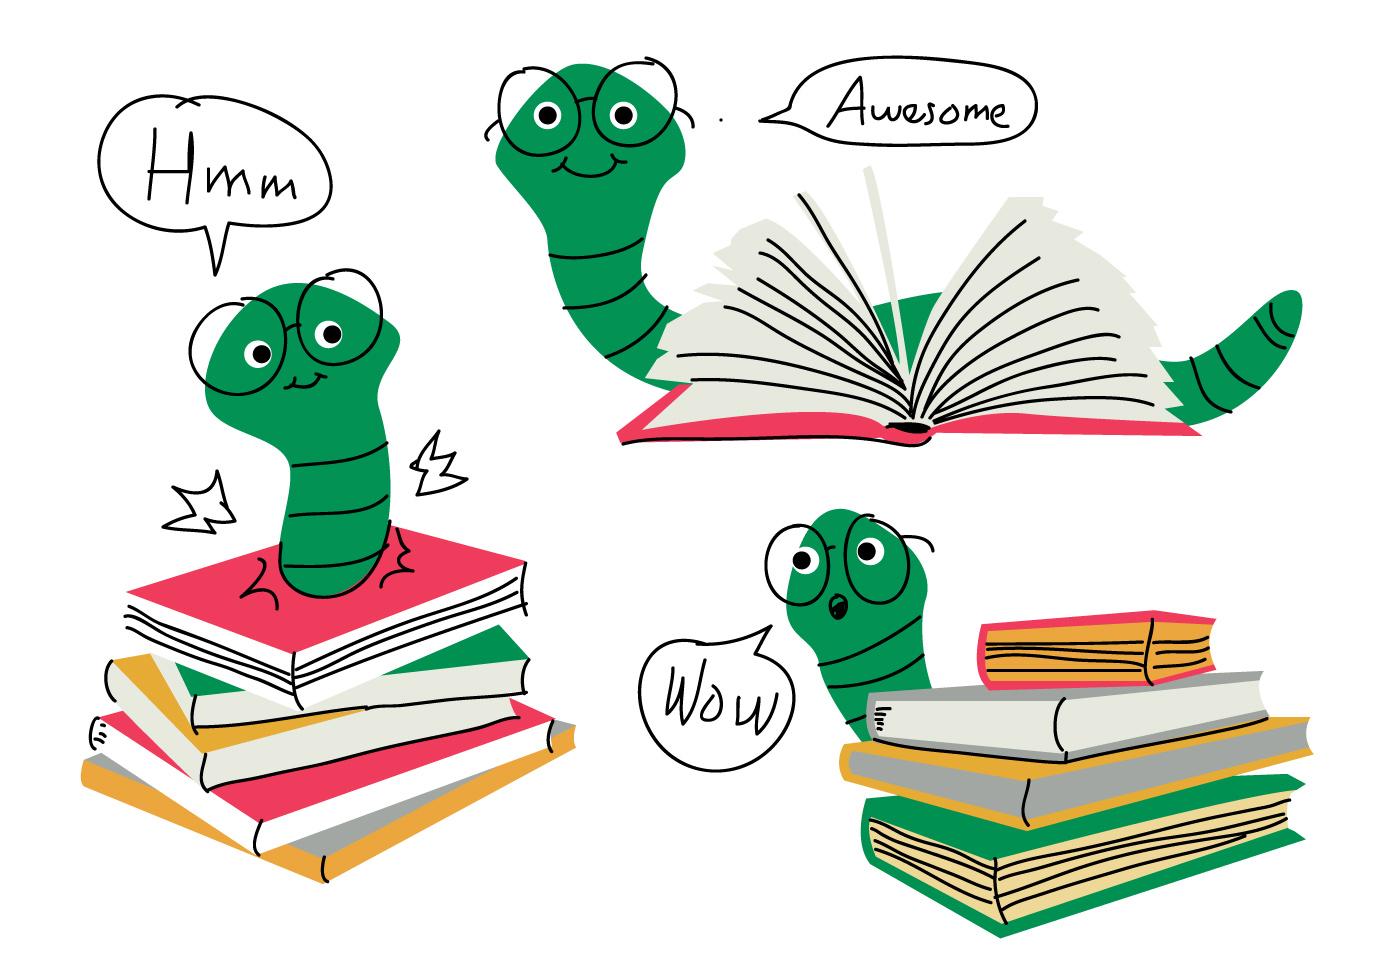 worm cartoon character doodle illustration vector illustrator clipart vectors books characters neuron logos vecteezy